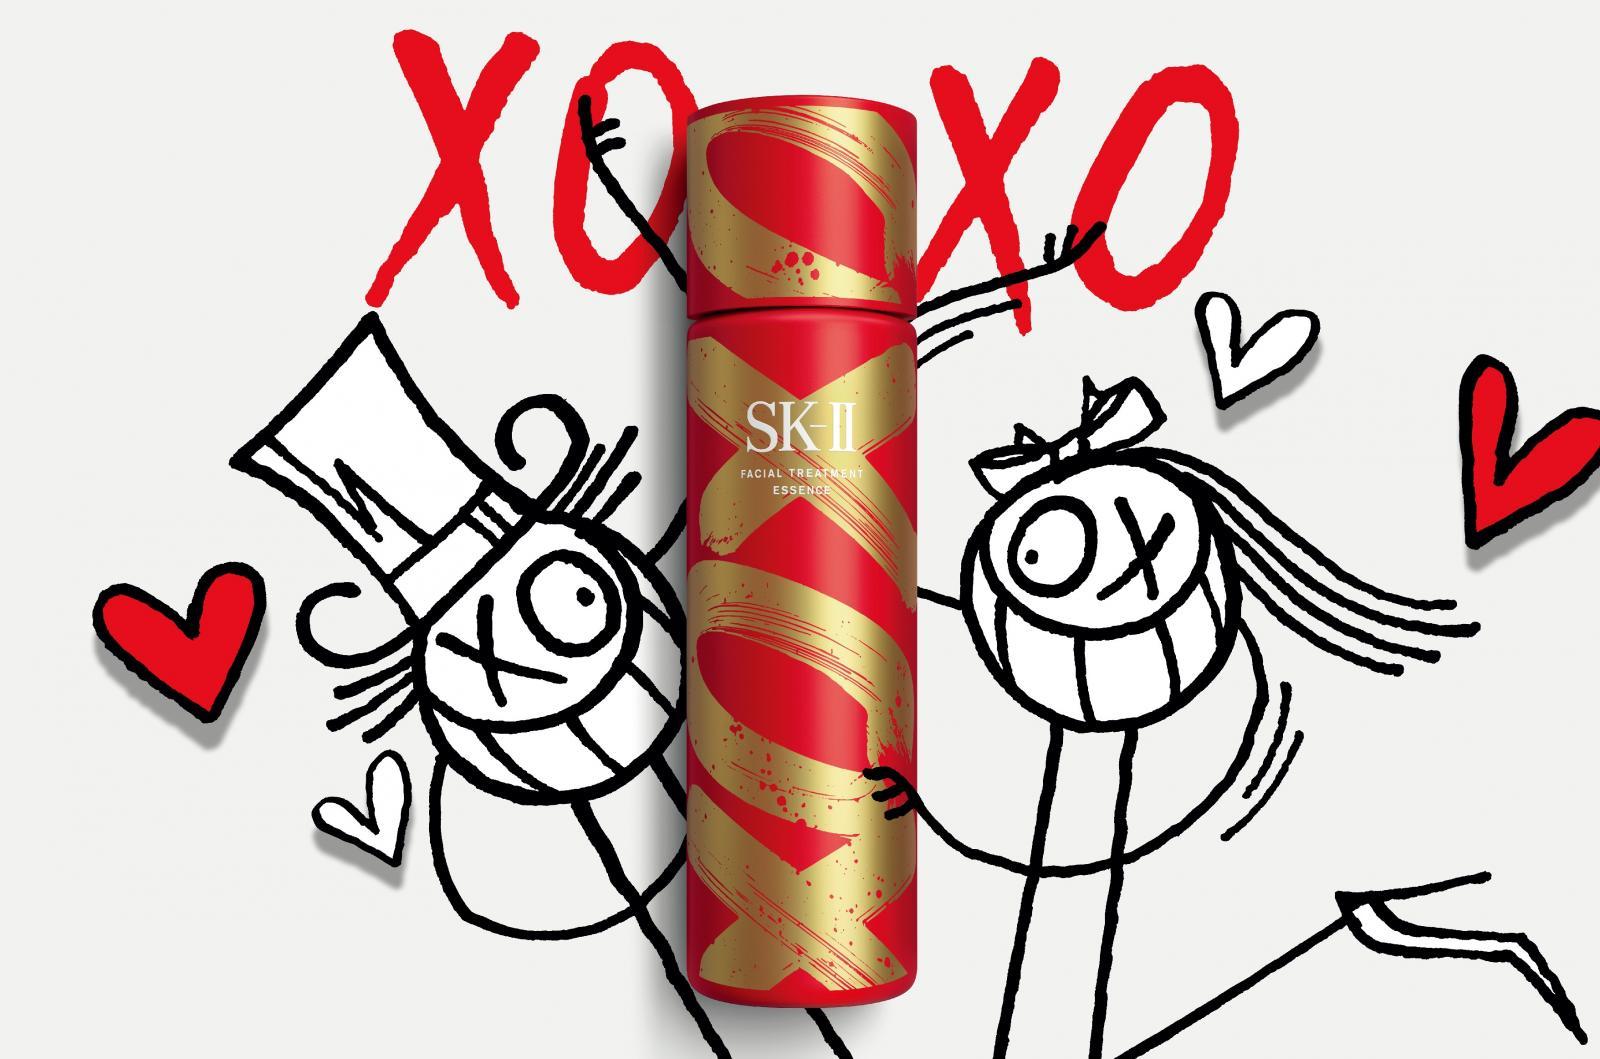 SK-II 青春露XOXO 新年限量版